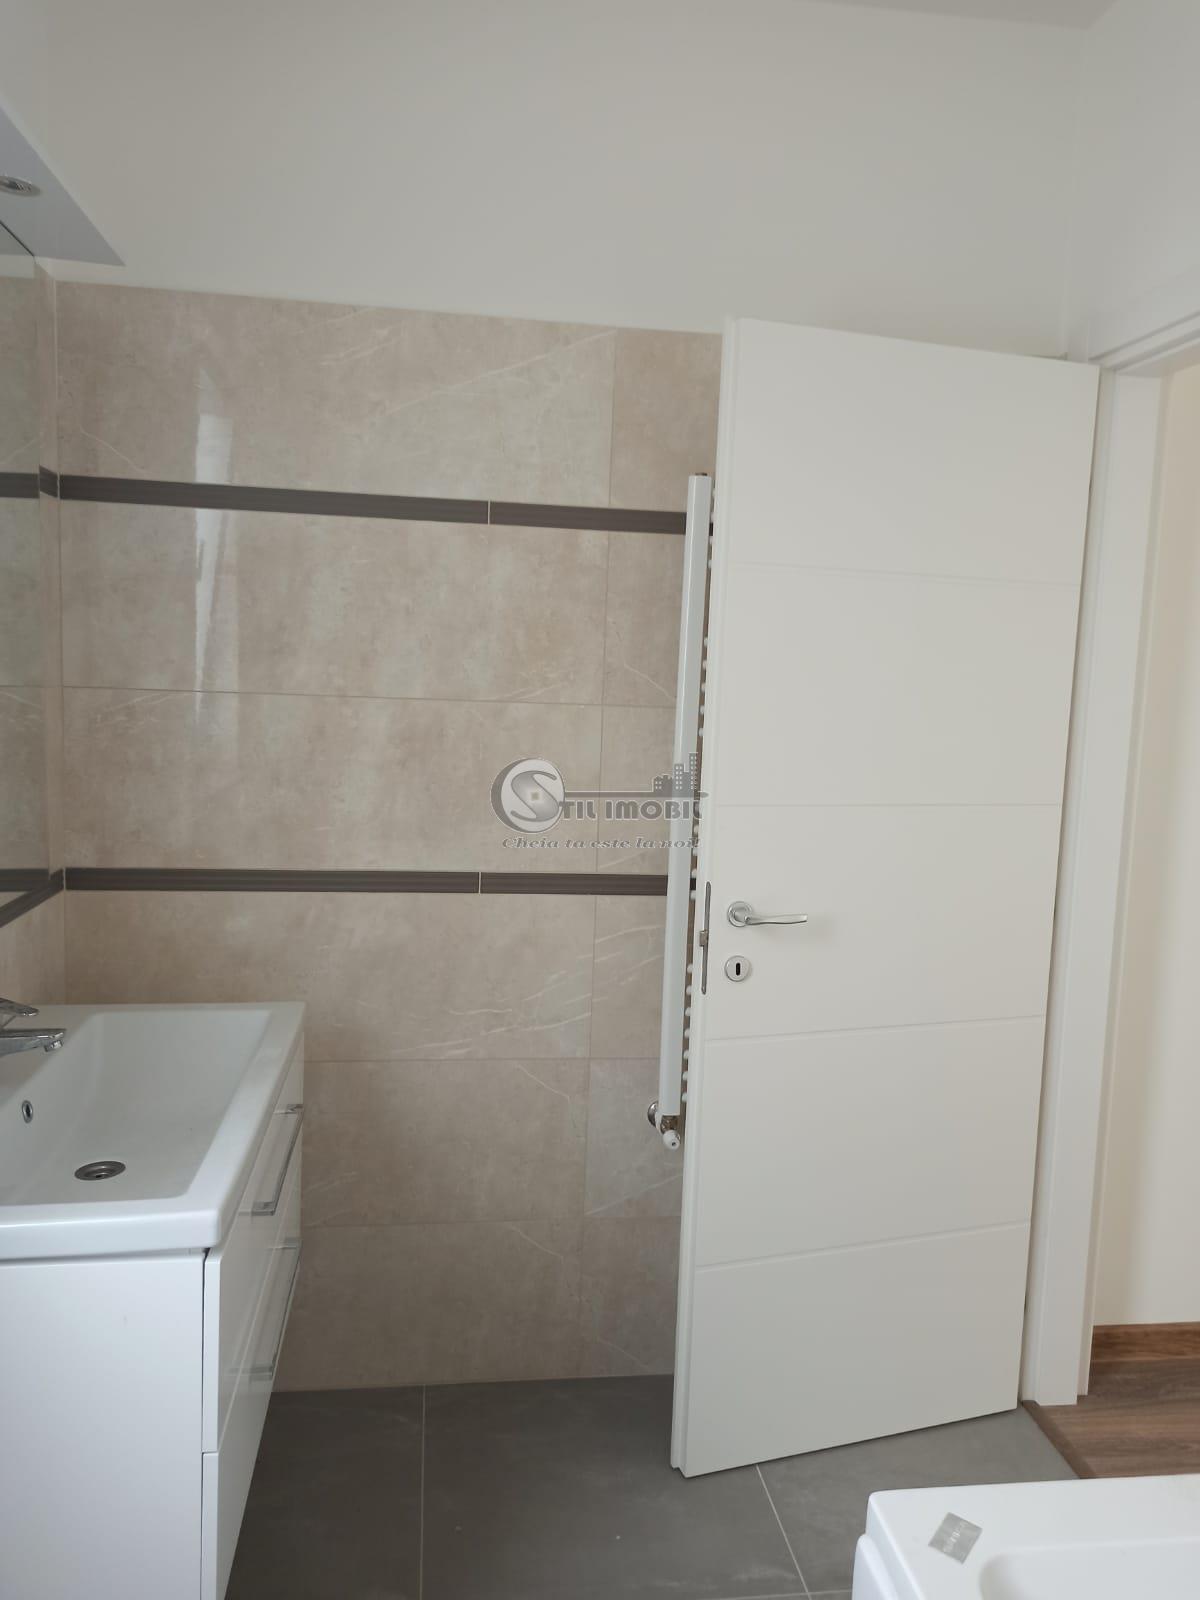 Apartament cu 2 camere 105 mp, Nicolina Cug, 85000 euro negociabil